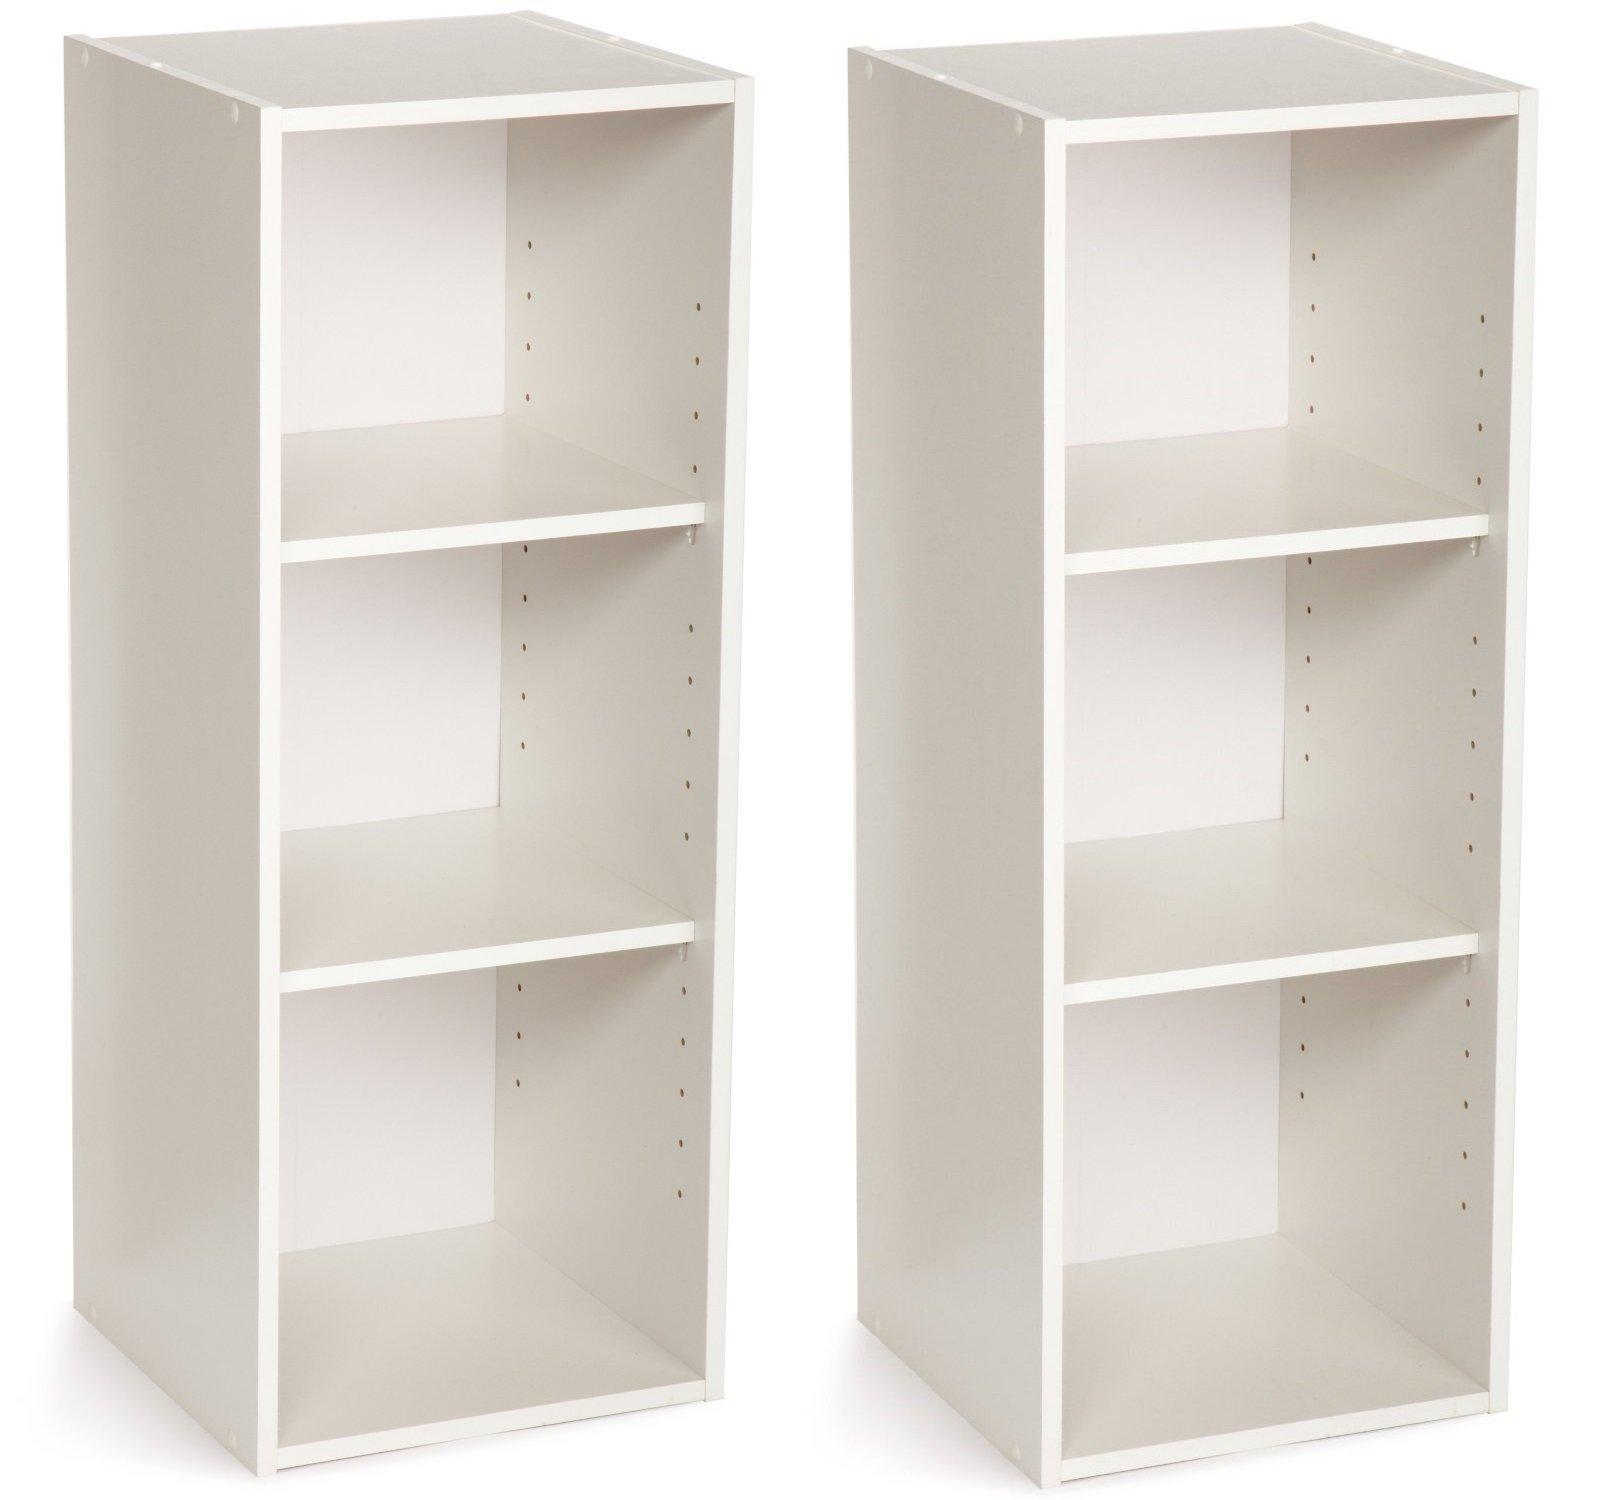 ClosetMaid 8987 Stackable 3-Shelf Organizer, White, 2-Pack